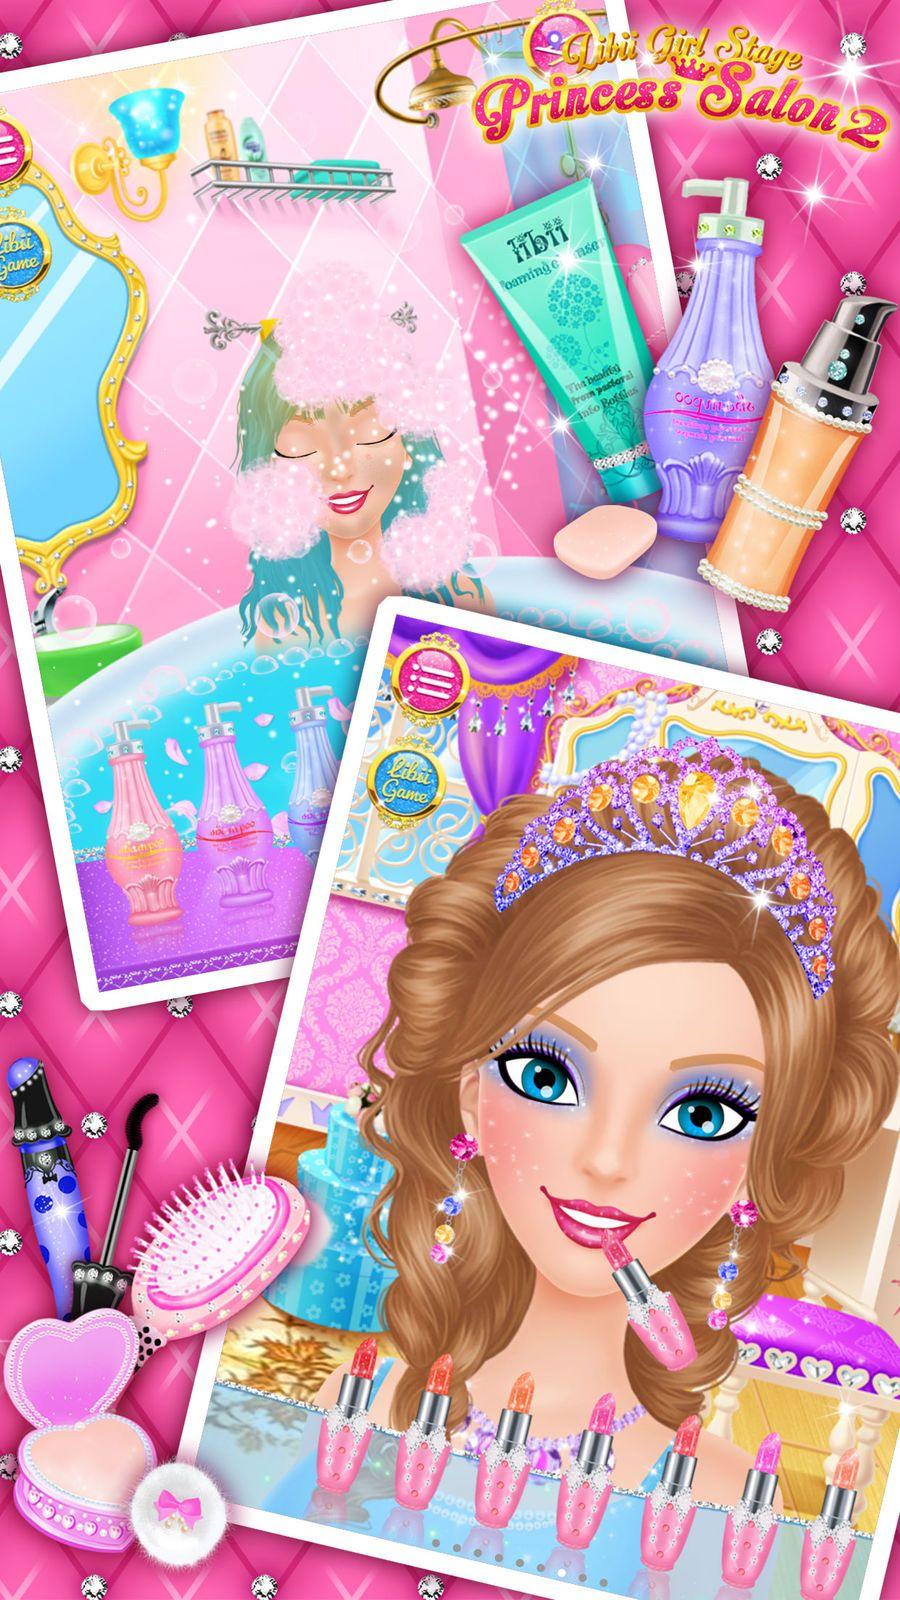 Princess Salon 2 Makeup Dressup Spa And Makeover Girls Beauty Salon Games Libii Games Beauty Family Beauty Salon Games Beauty Girl Salons